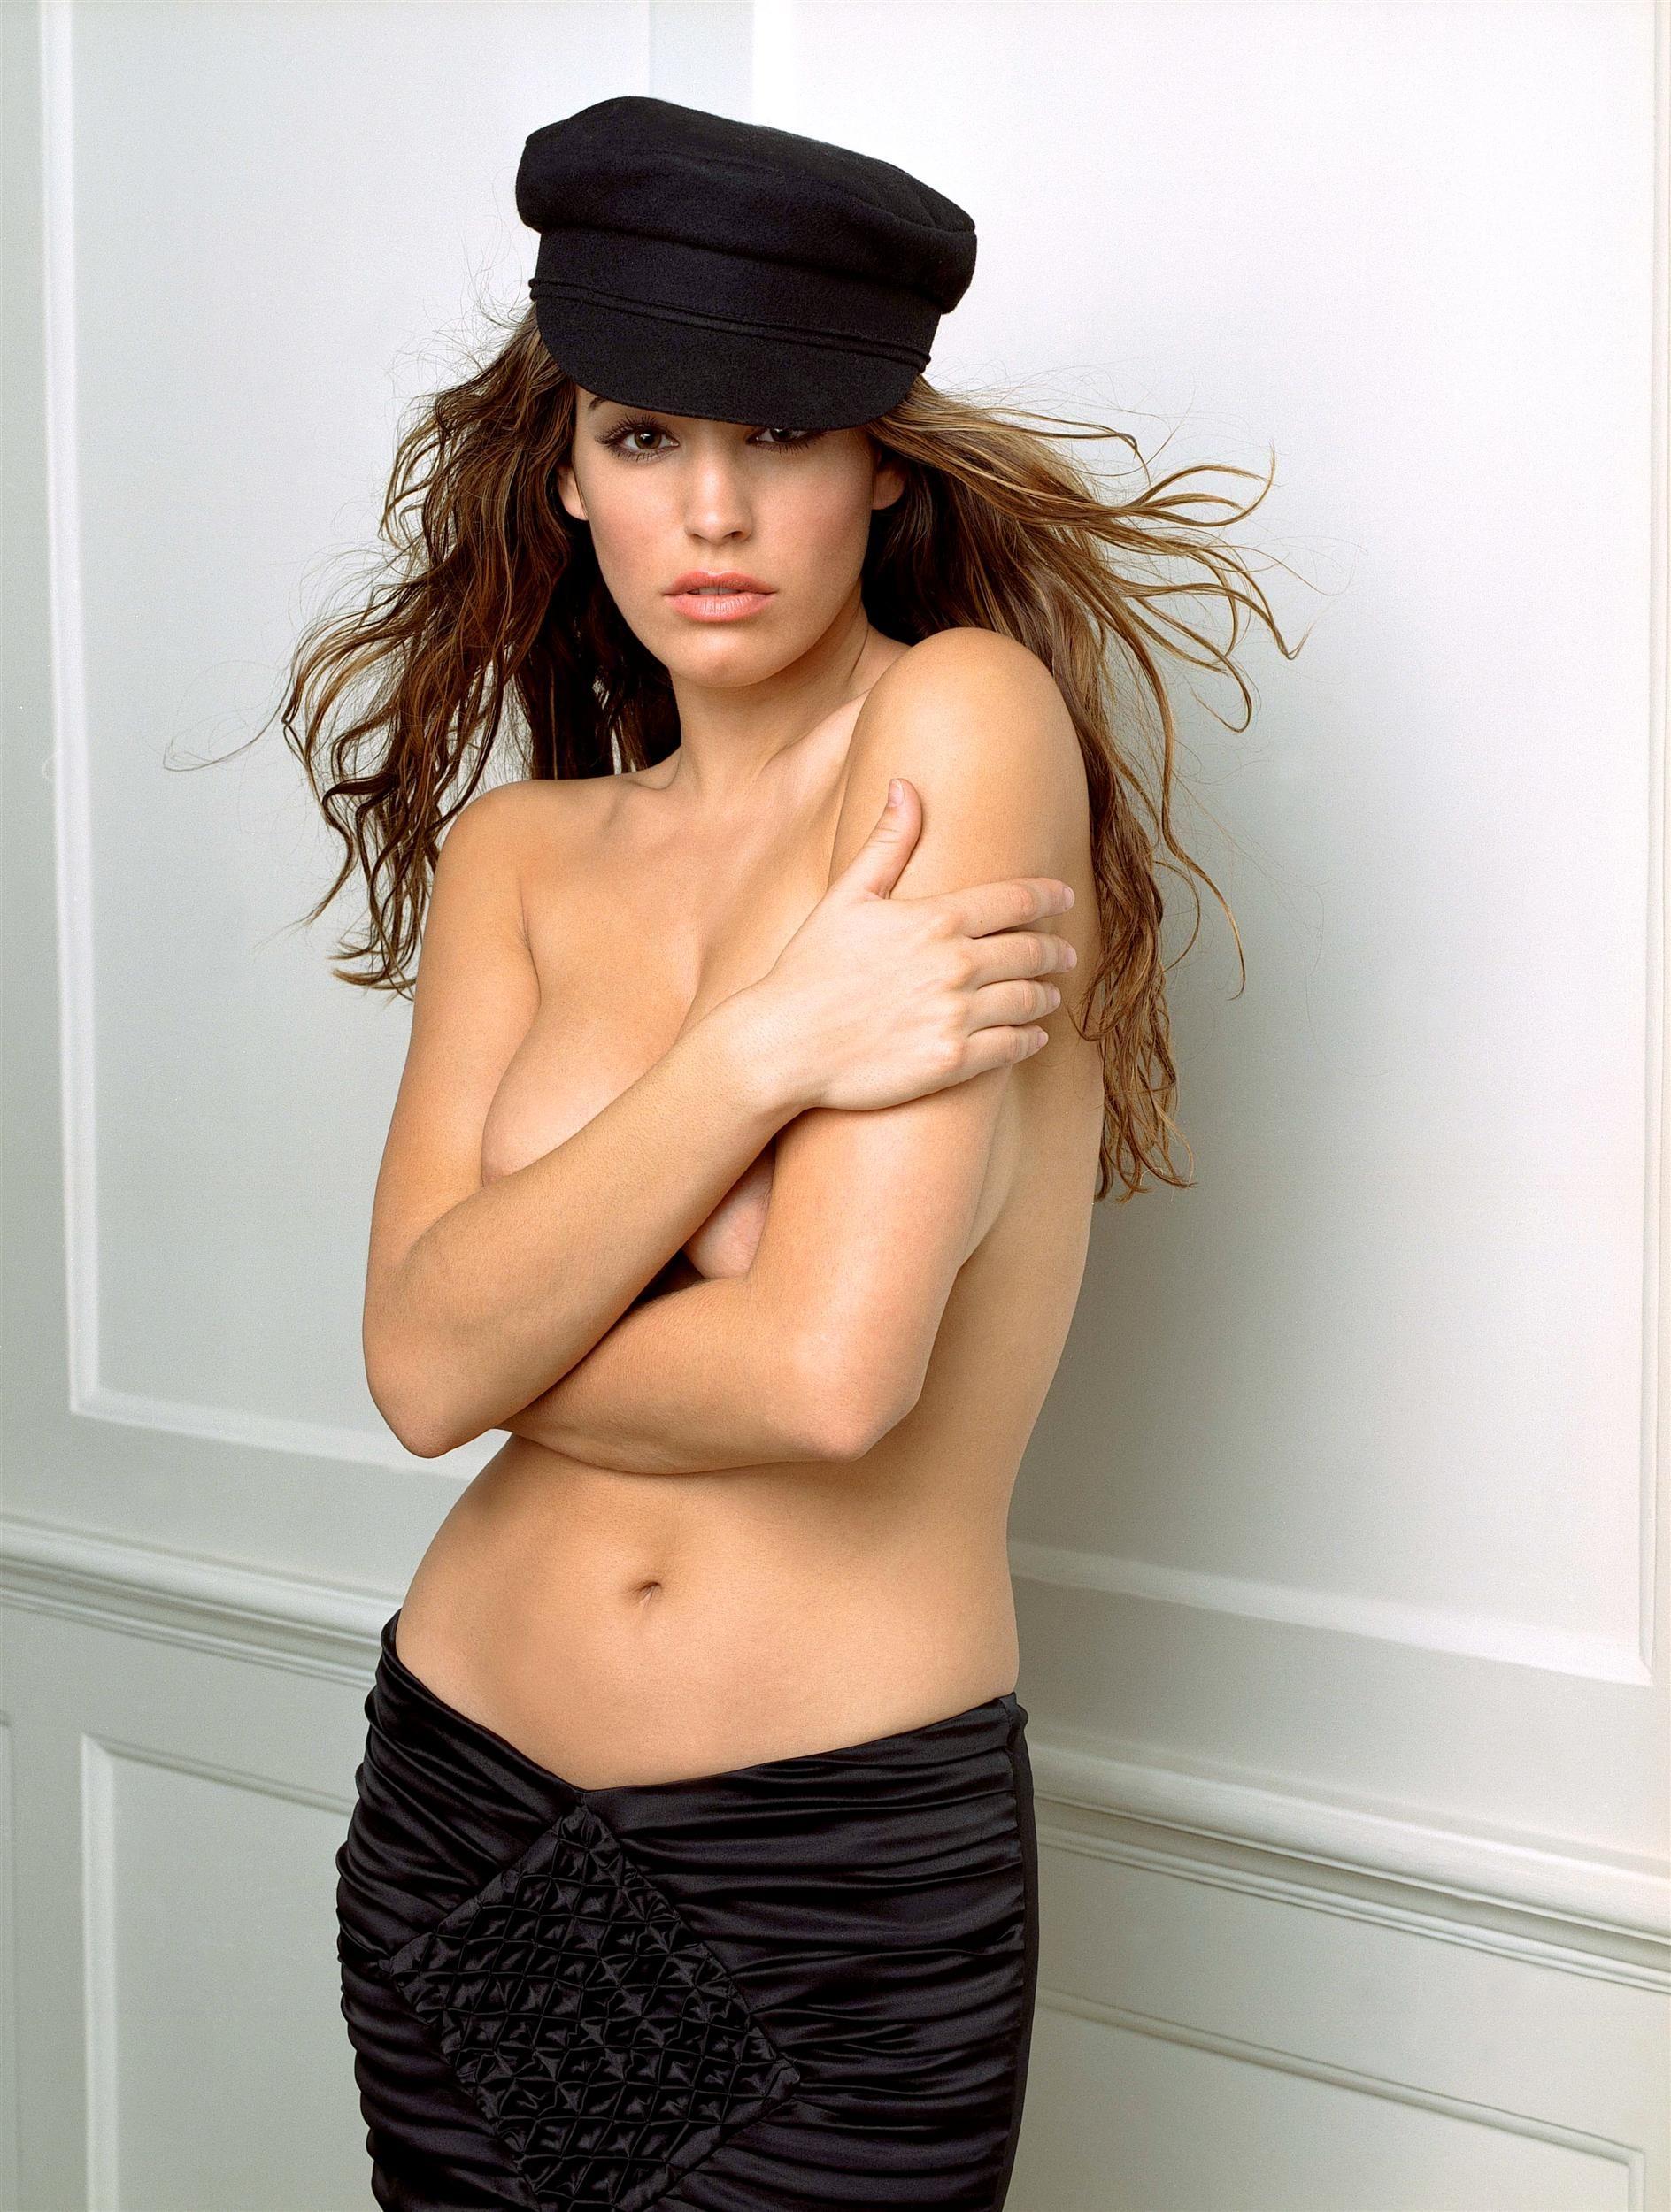 Alexandra Stan Sexy. 2018-2019 celebrityes photos leaks!